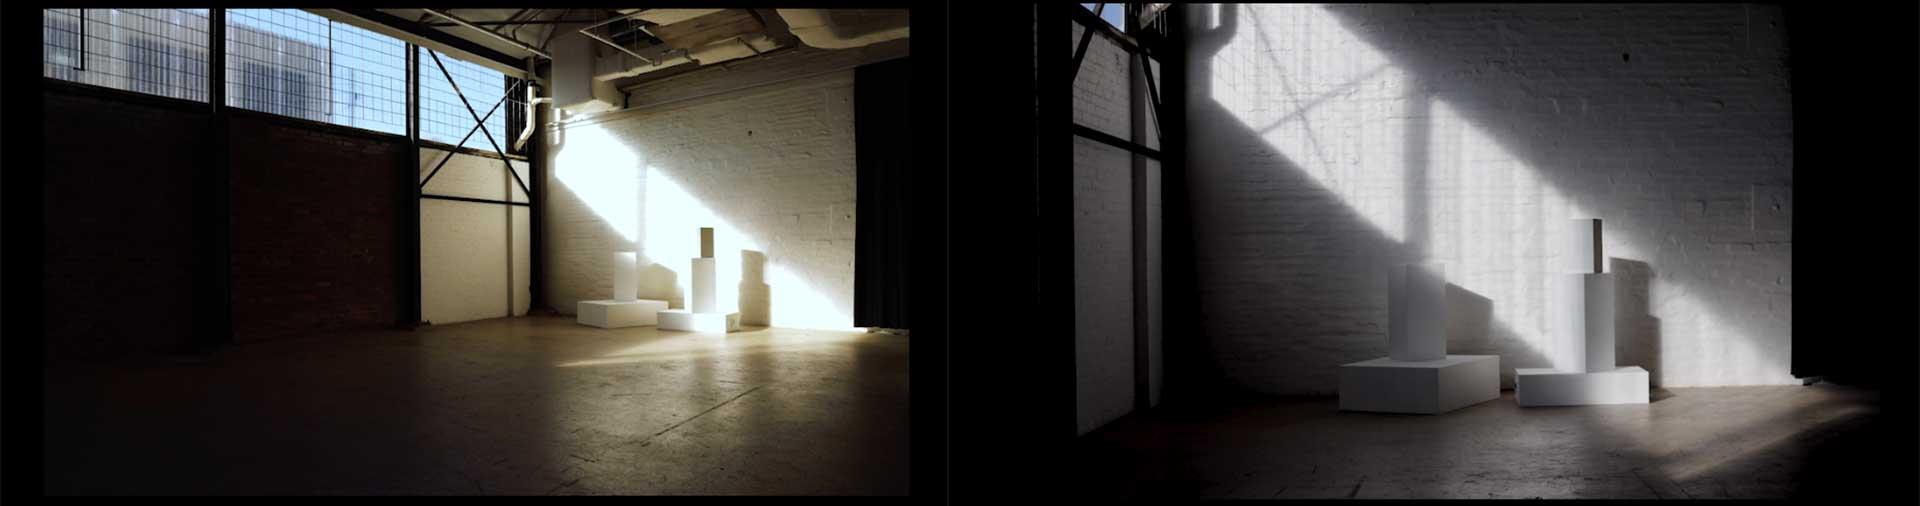 SUNSTUDIOS Melbourne Studio 2 Photography